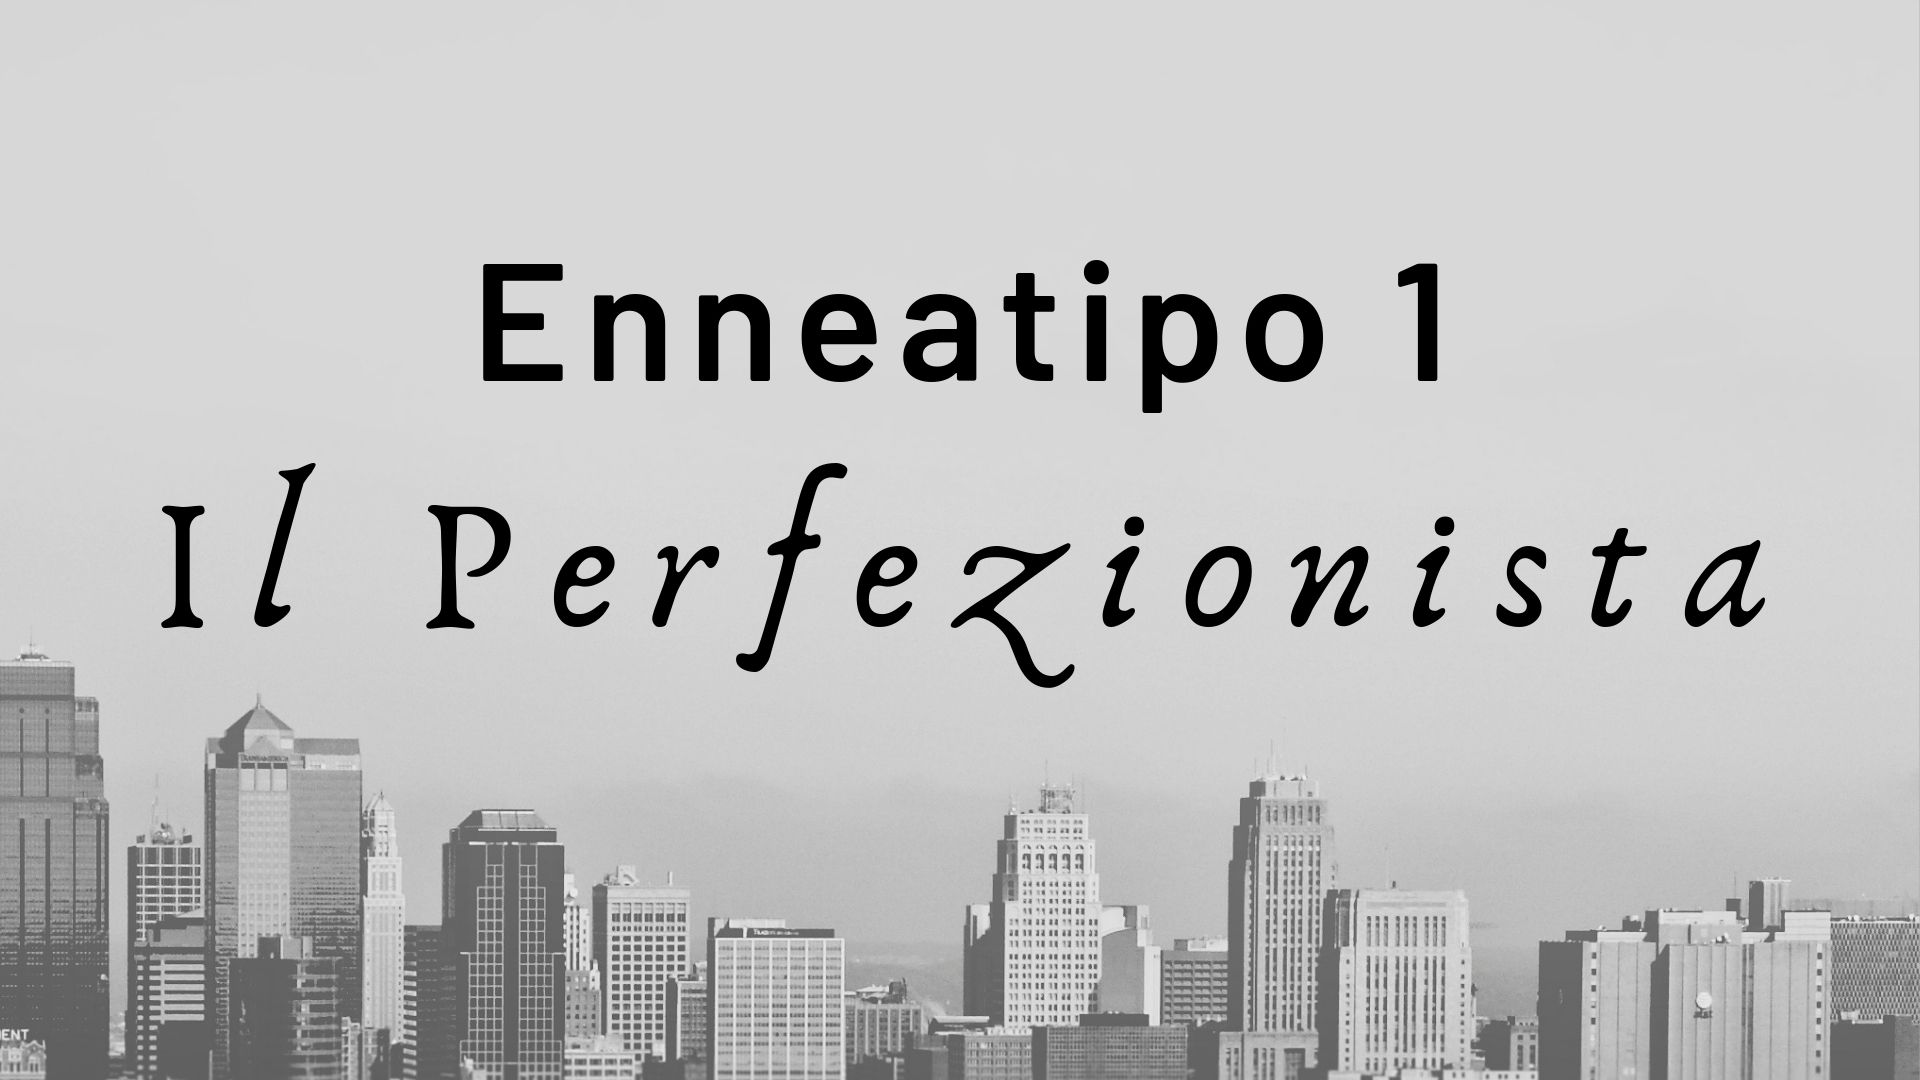 enneatipo 1